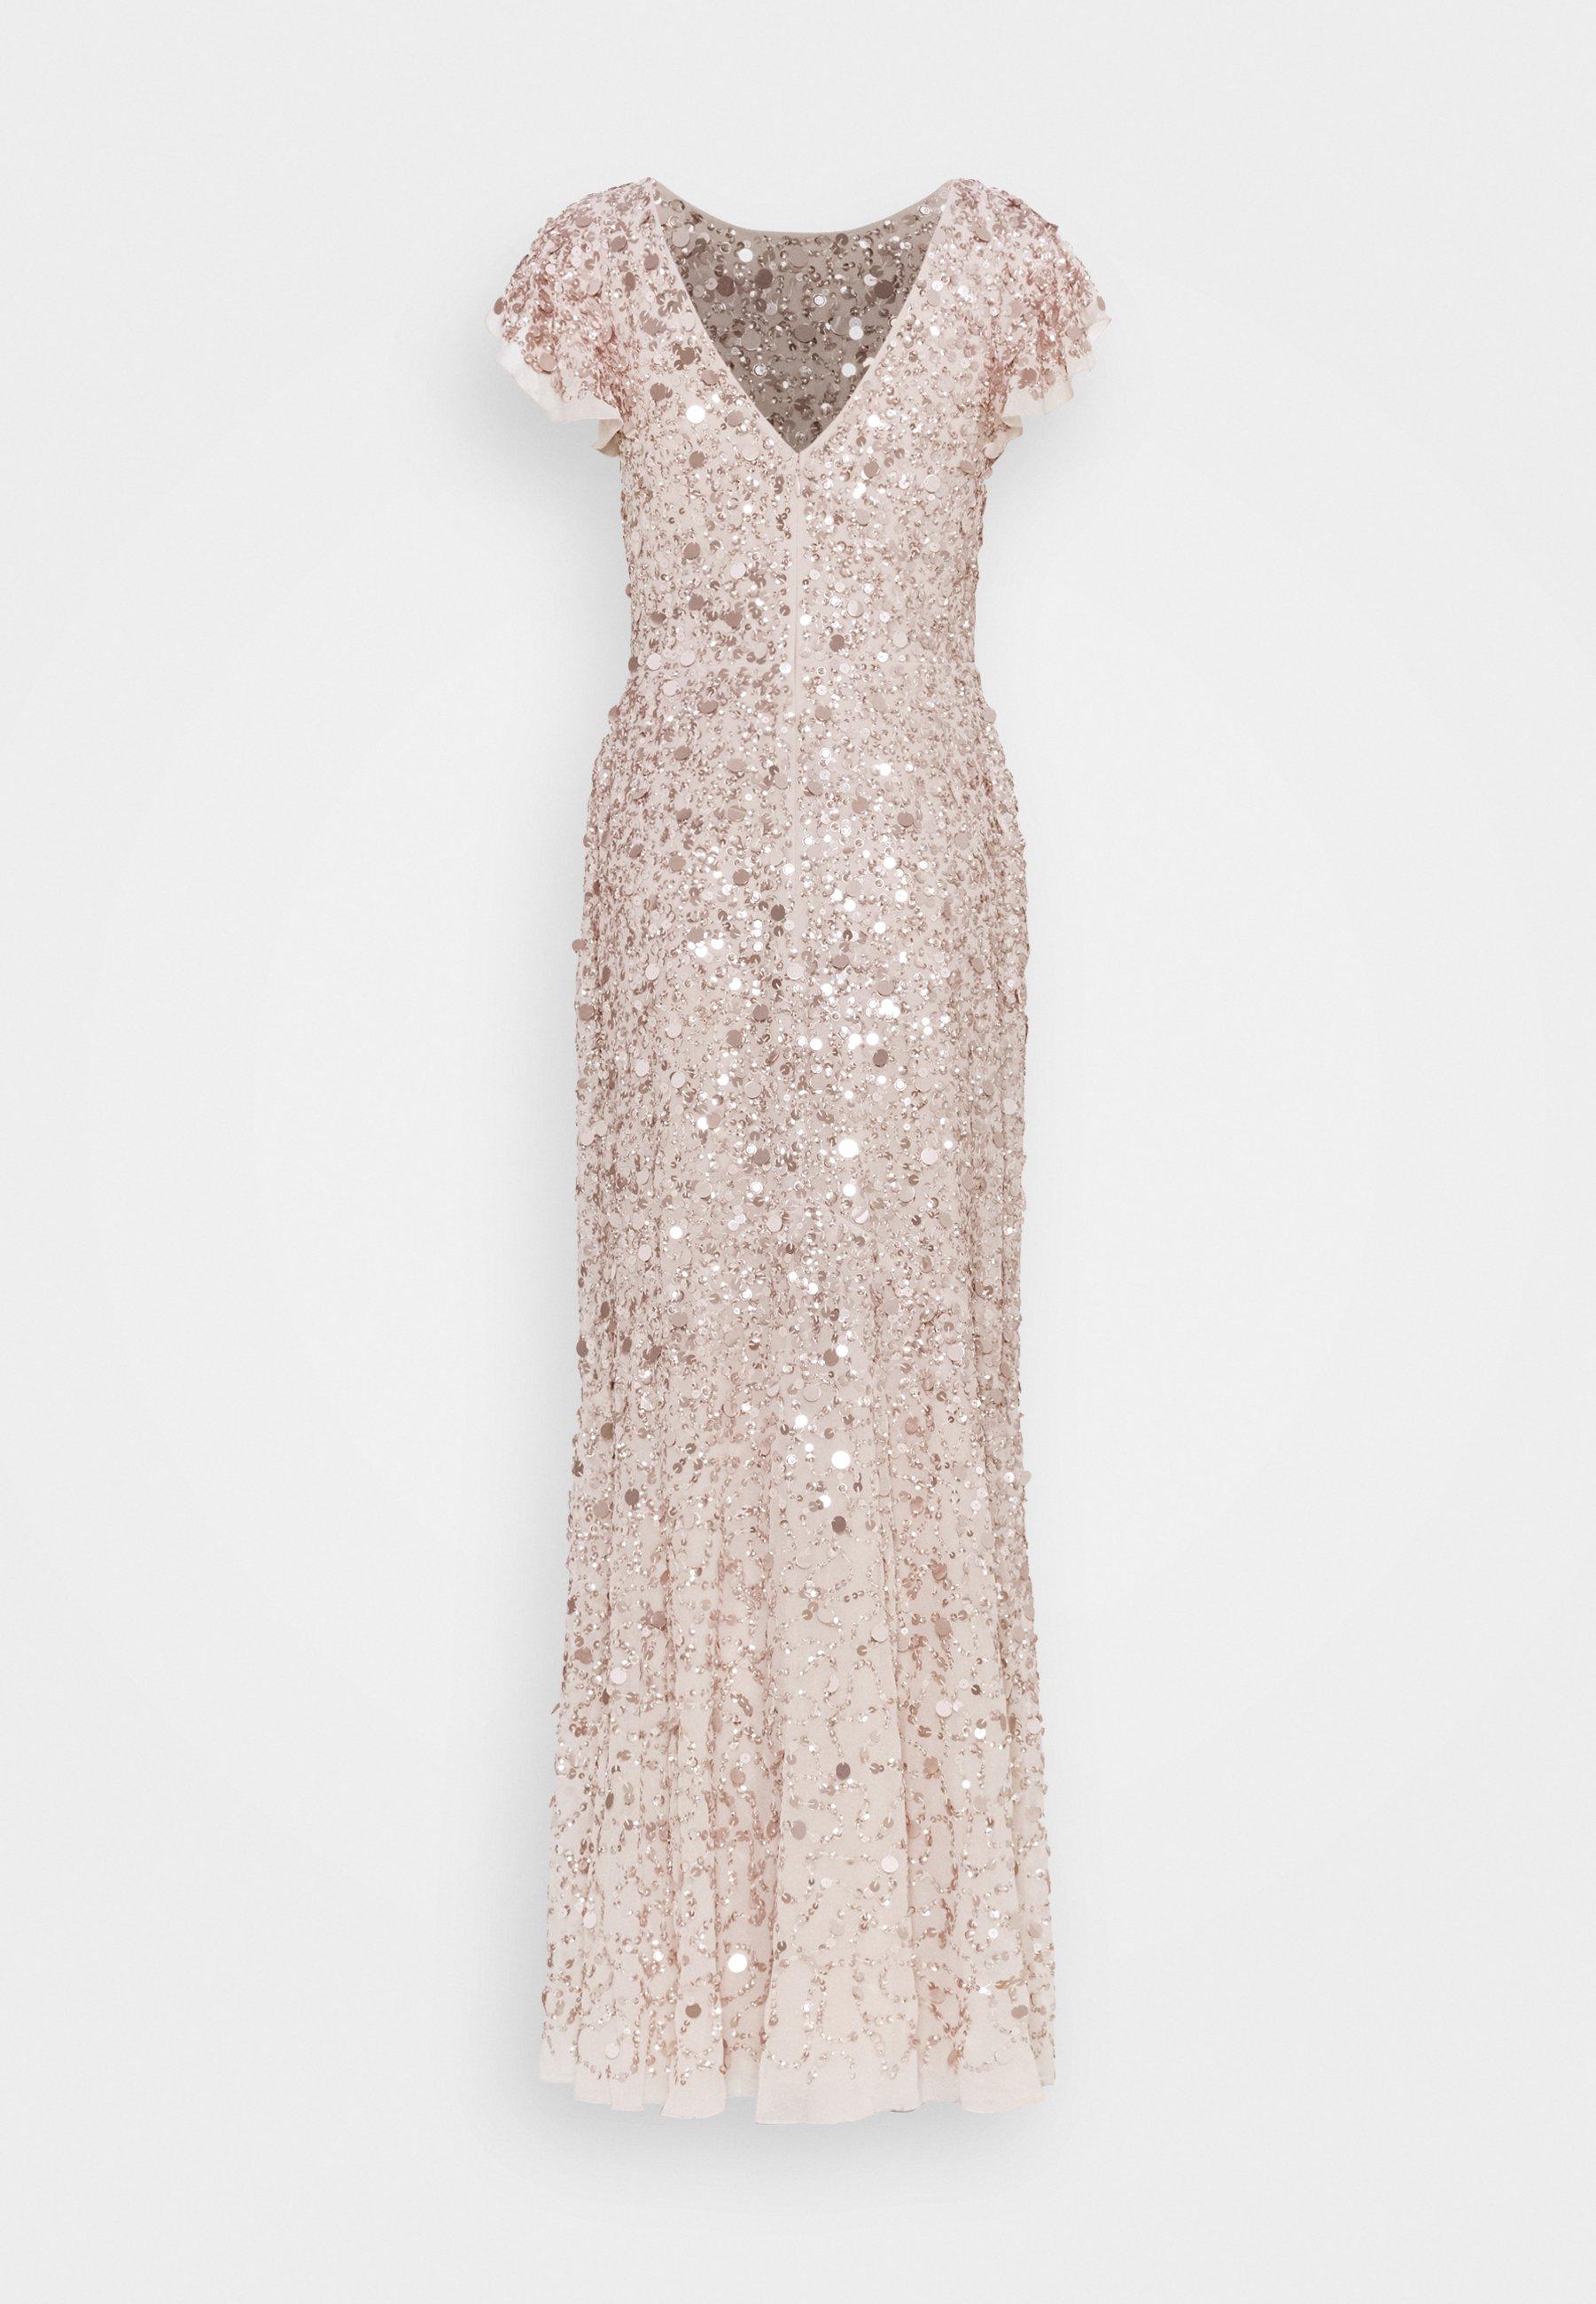 Maya Deluxe Flutter Sleeve All Over Sequin Maxi Dress Robe De Cocktail Rose Gold Rose Clair Zalando Be